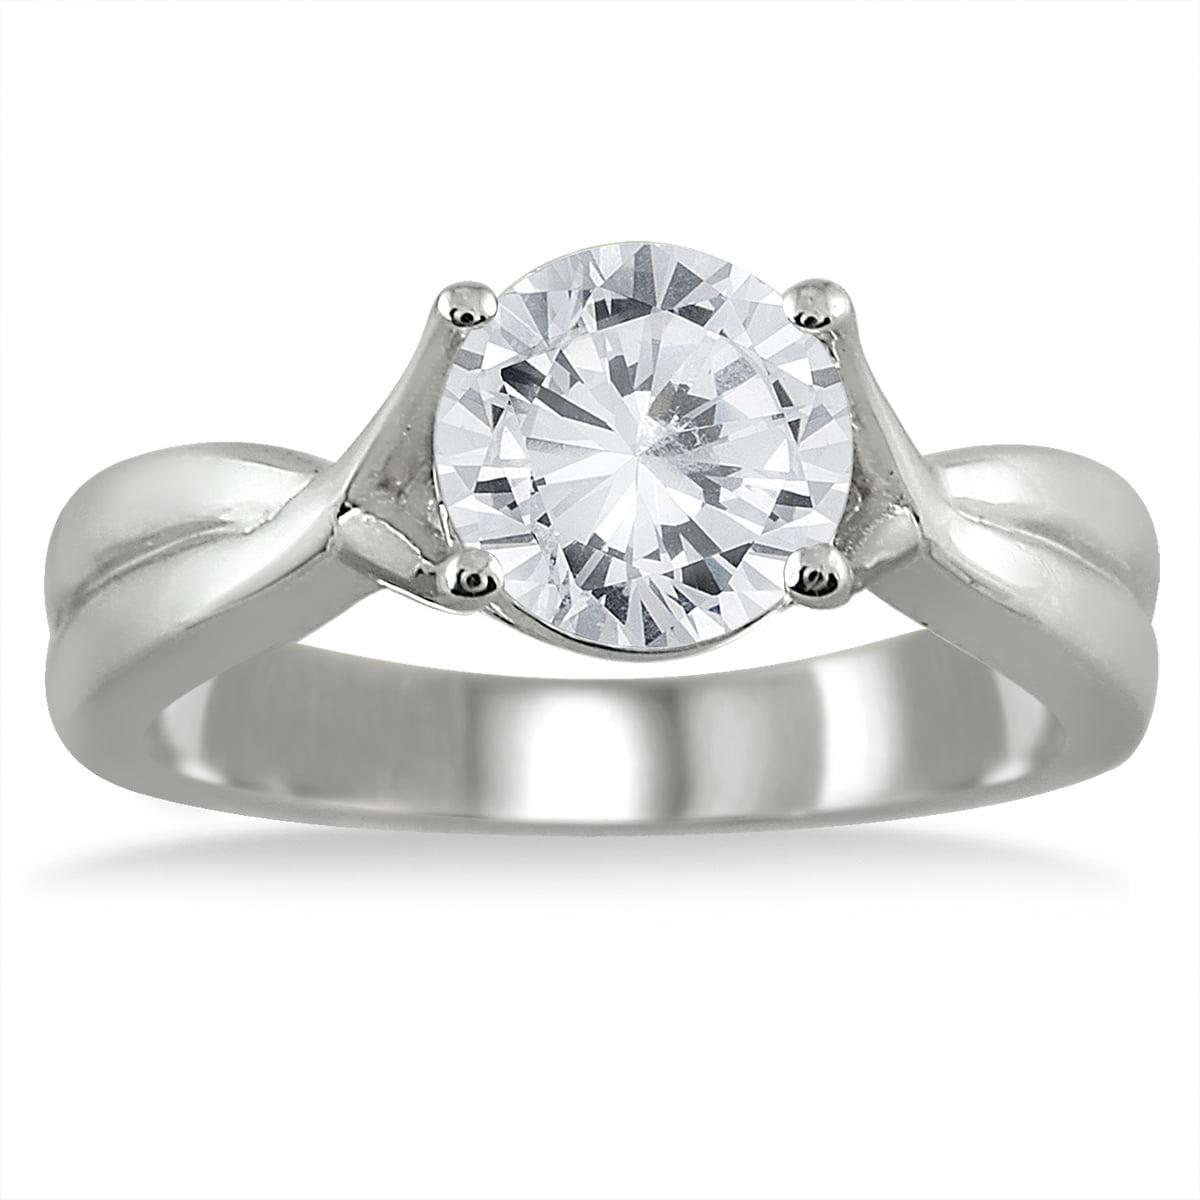 Szul Ags Certified 1 Carat Diamond Solitaire Ring In 14k